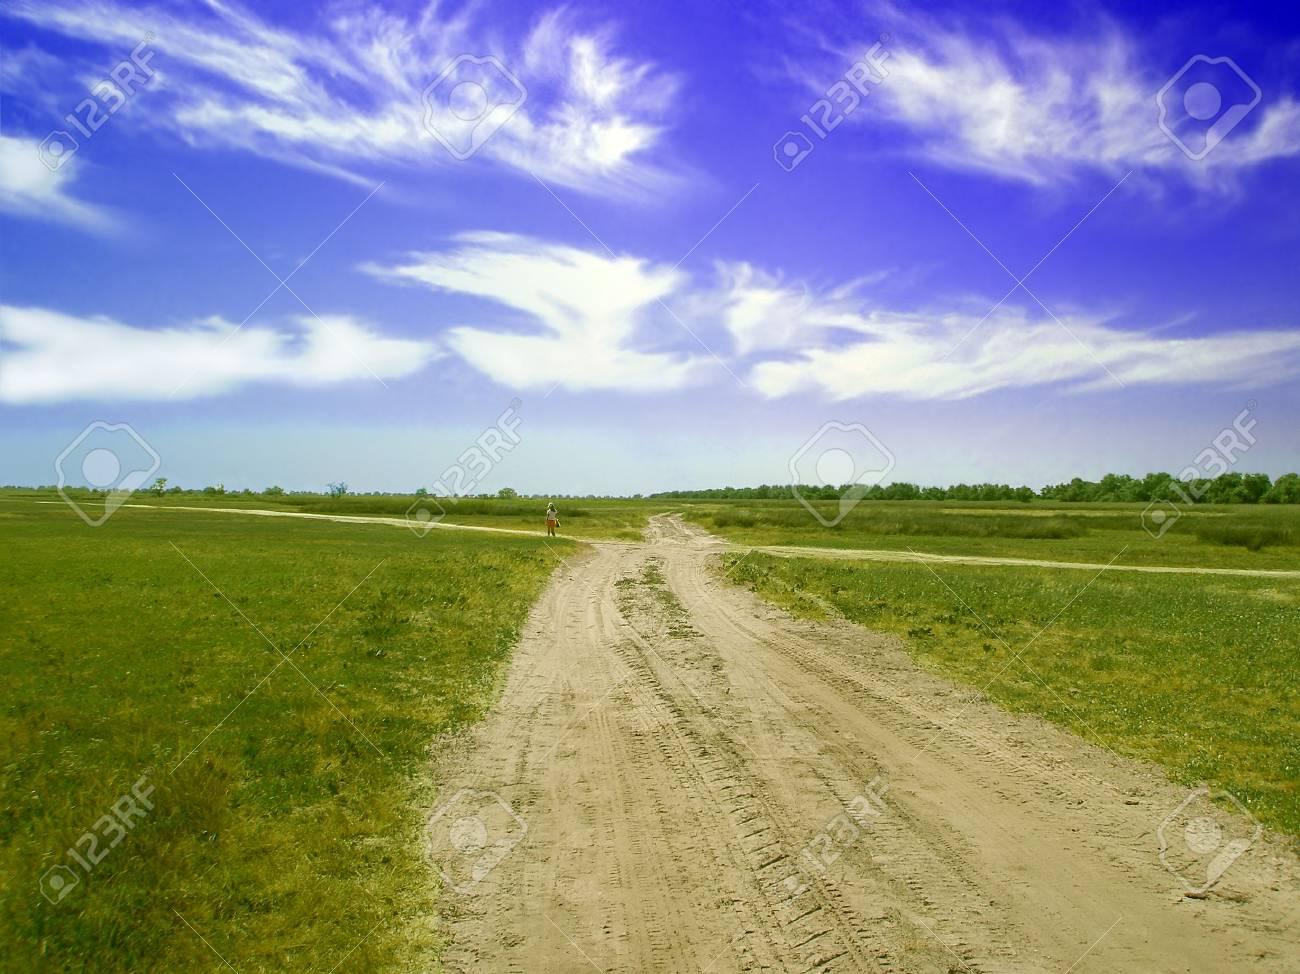 Rural sandy road.The little girl away on rural sandy road among grassland Stock Photo - 7709083